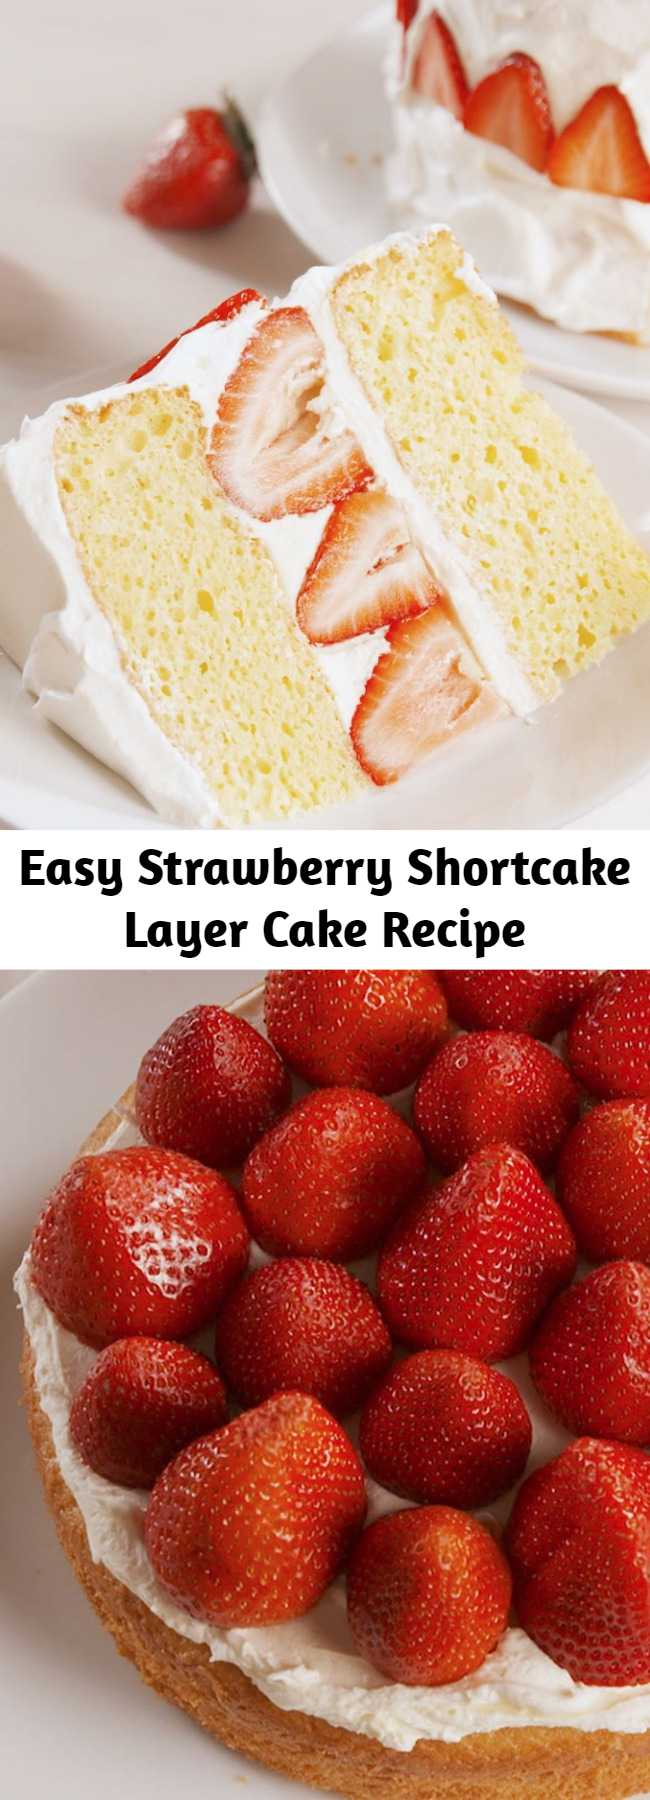 Easy Strawberry Shortcake Layer Cake Recipe - The ultimate strawberry shortcake. It's 100x better than traditional strawberry shortcake. #food #easycake #cake #strawberry #dessert